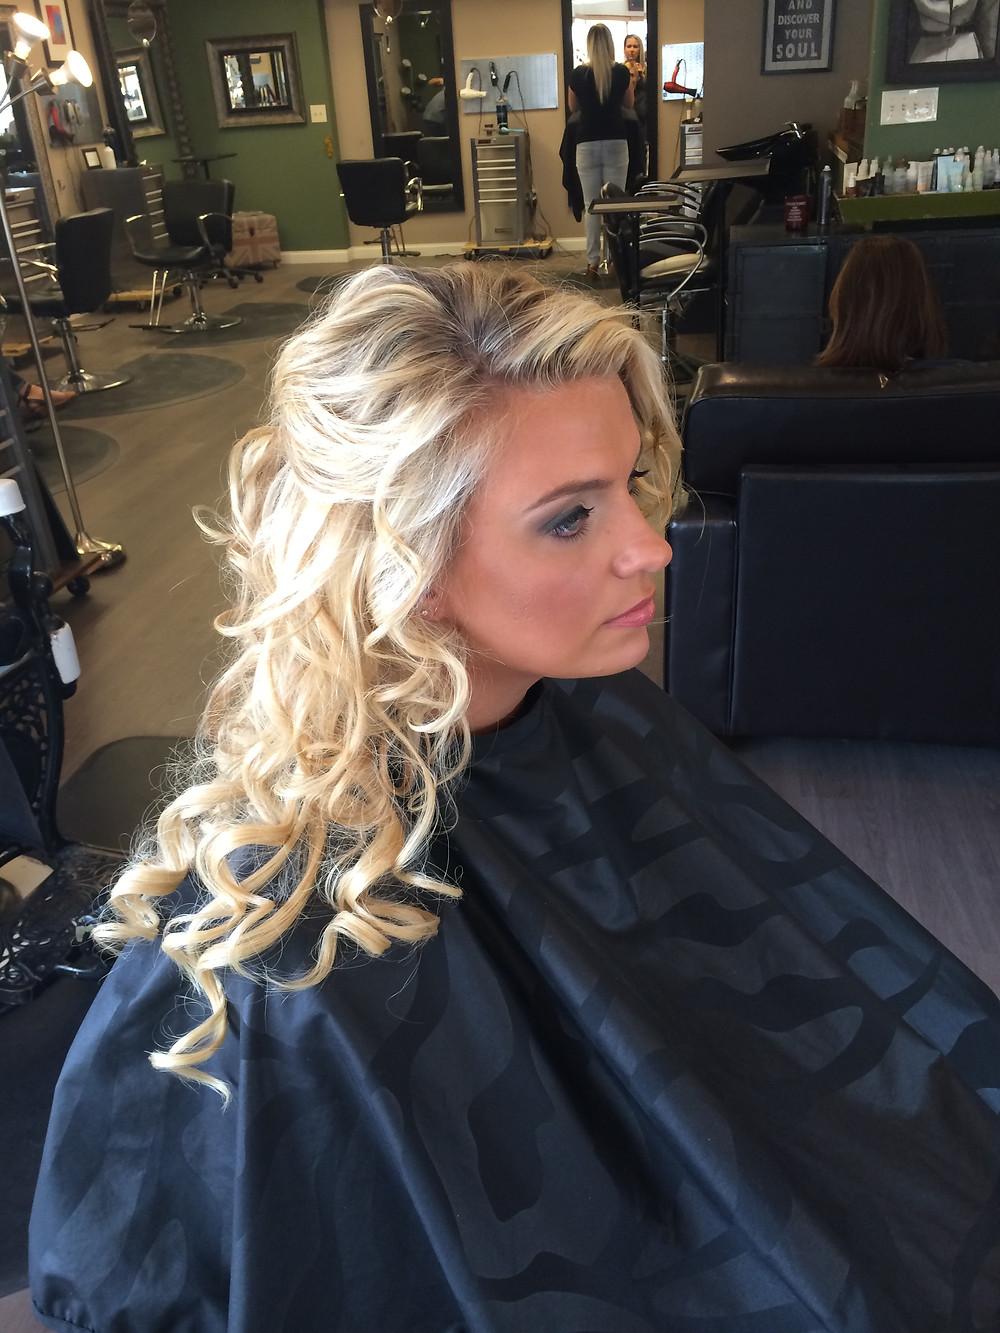 Hair & Makeup by Sara K | Half-up curled bridesmaid style